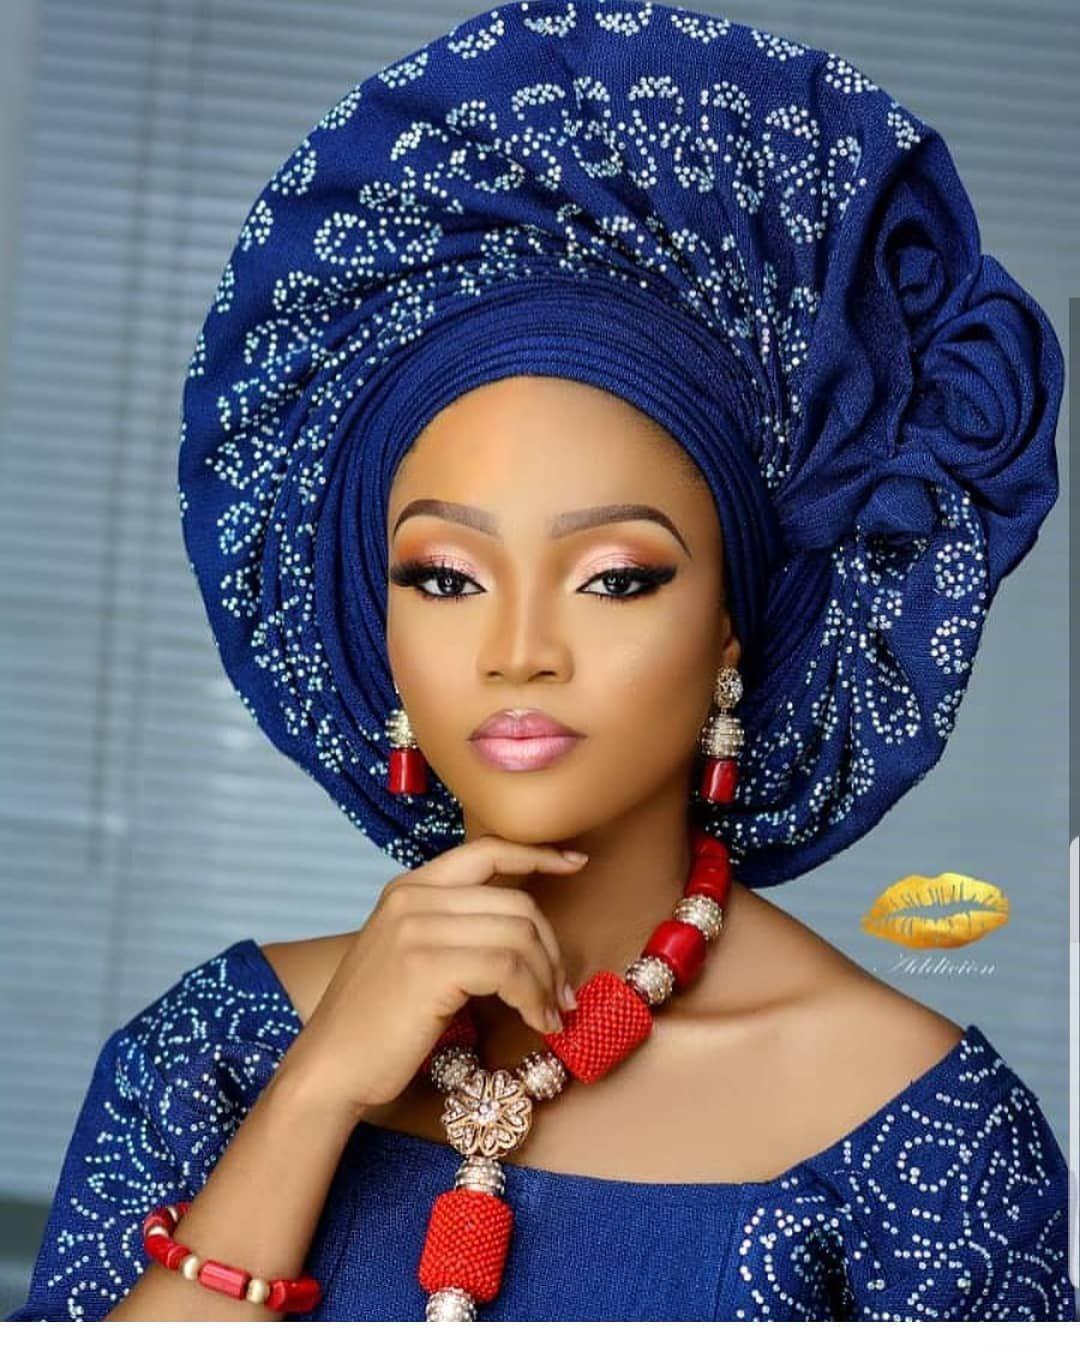 What name do we call this headgear style? 😍🌟 #AsoEbiBella ...